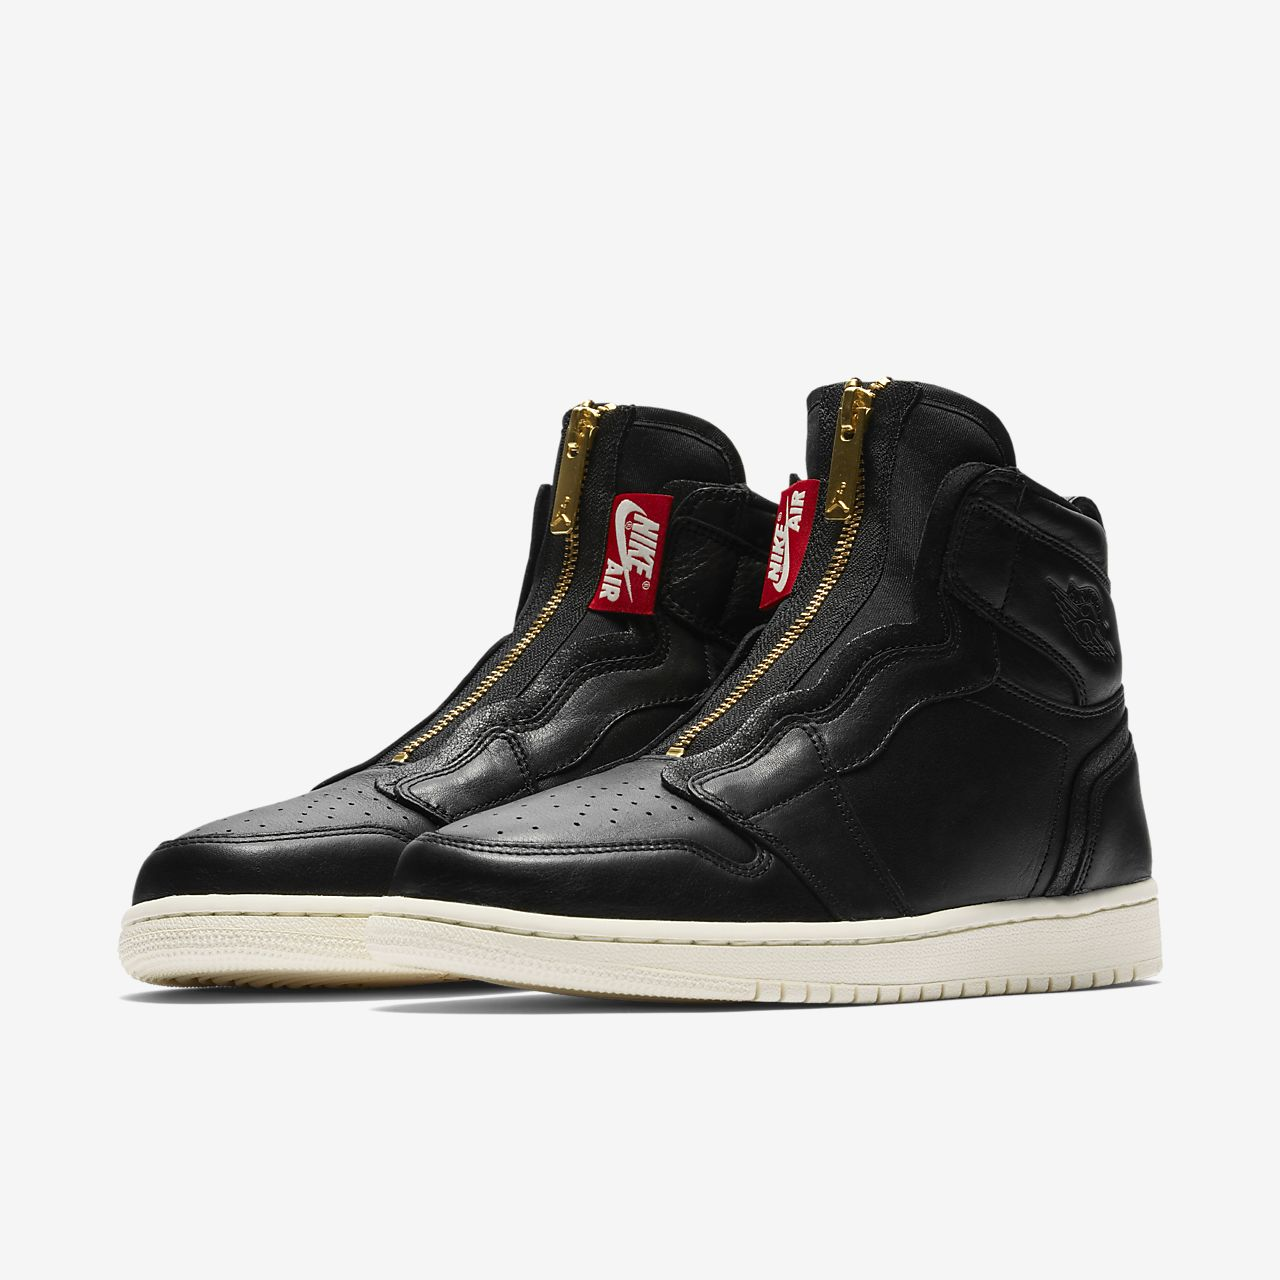 magasin en ligne 81eaa 76465 Chaussure Air Jordan 1 High Zip pour Femme